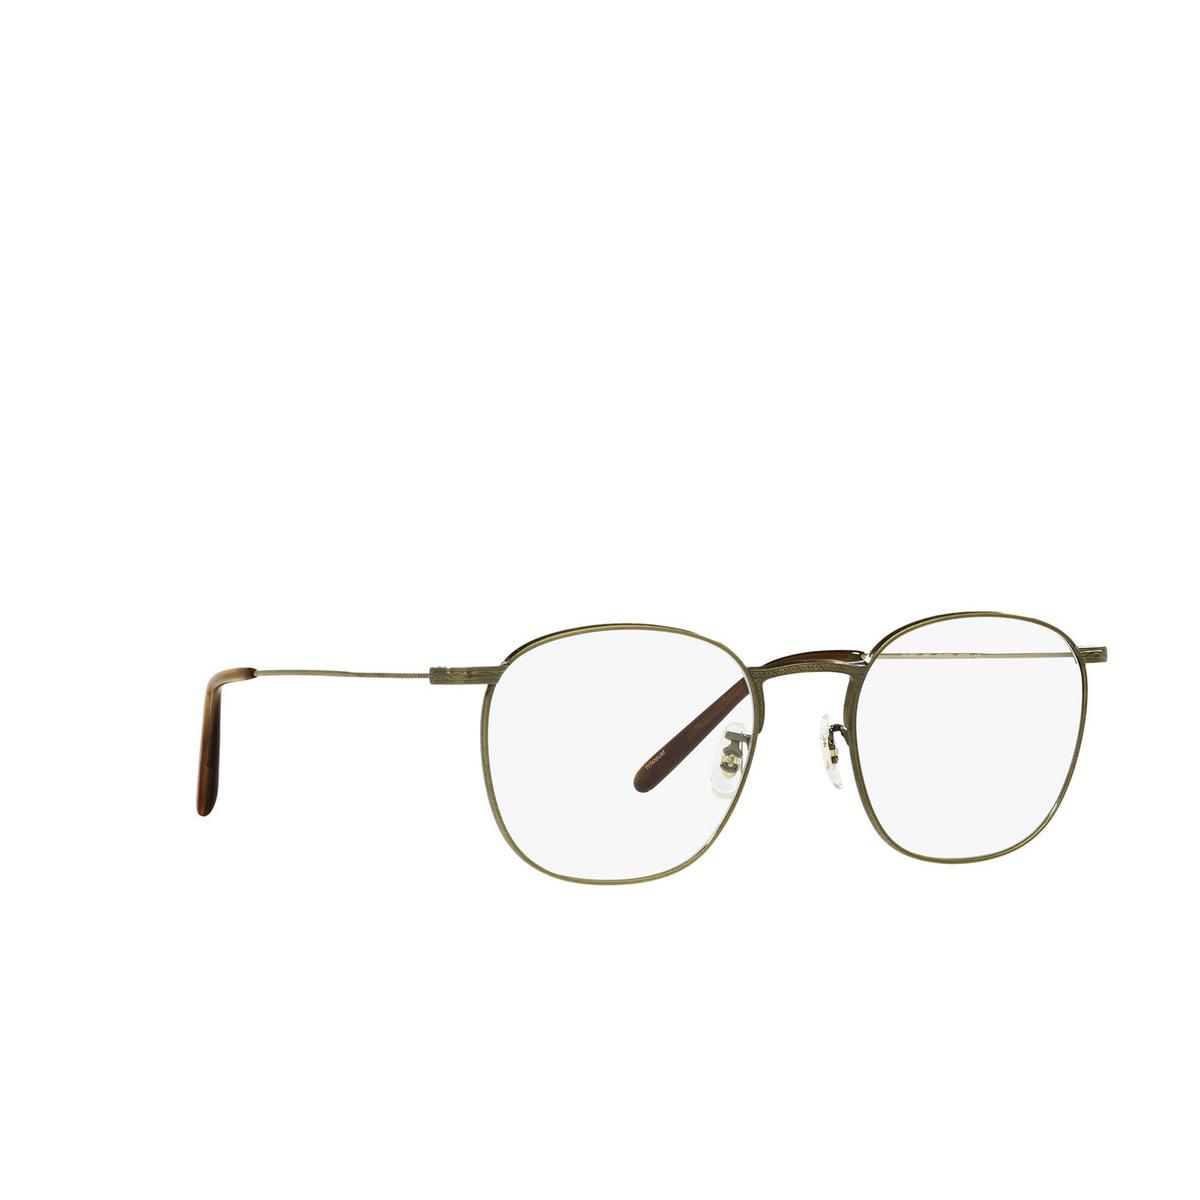 Oliver Peoples® Square Eyeglasses: Goldsen OV1285T color Antique Gold 5284 - three-quarters view.